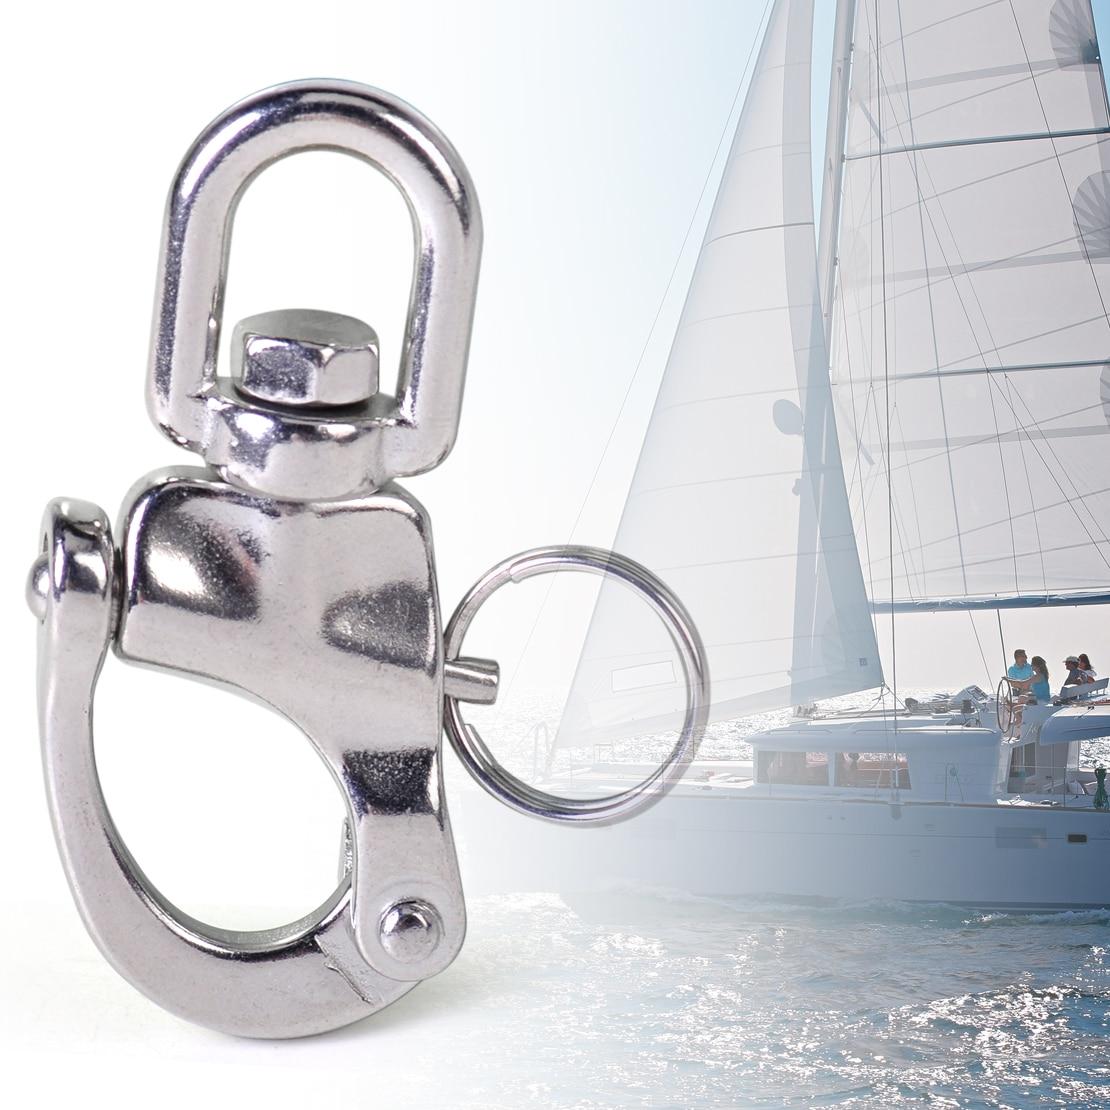 Stainless Steel Heavy Duty Snap Shackle D Ring Swivel Bail Marine Boat Yacht